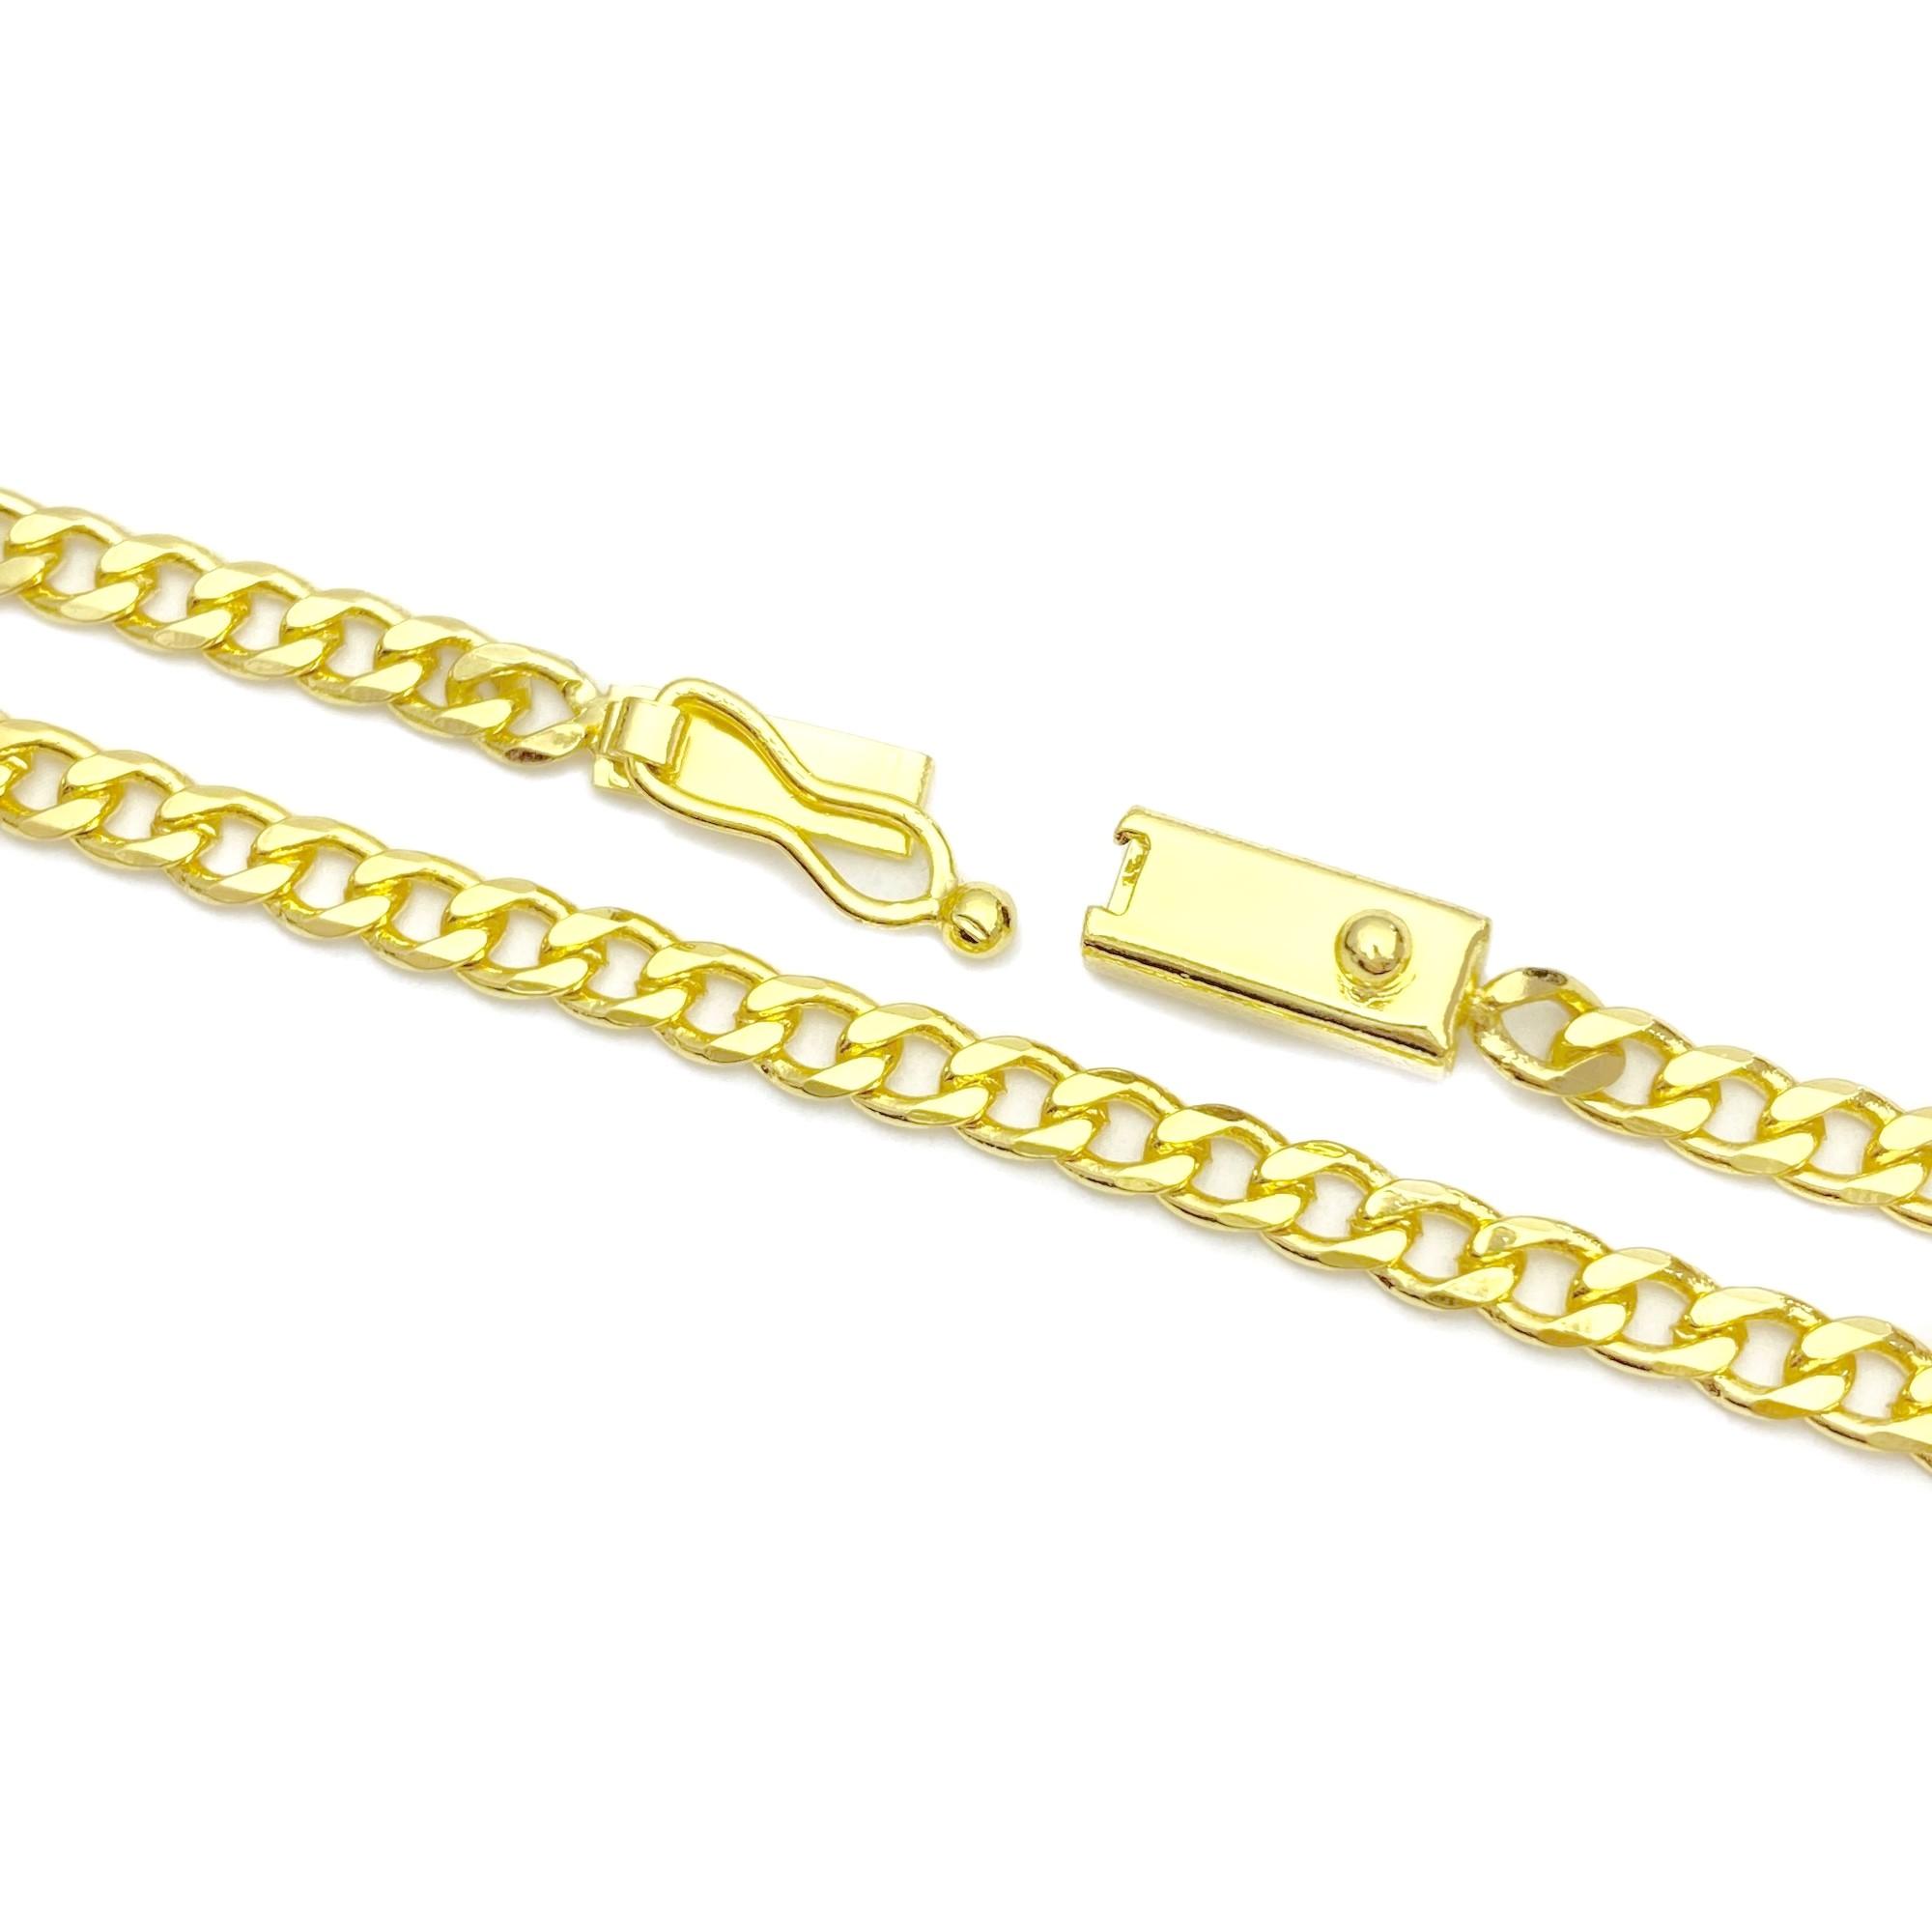 Corrente Grumet 2,8mm 70cm (12,3g) (Fecho Gaveta) (Banho Ouro 24k)